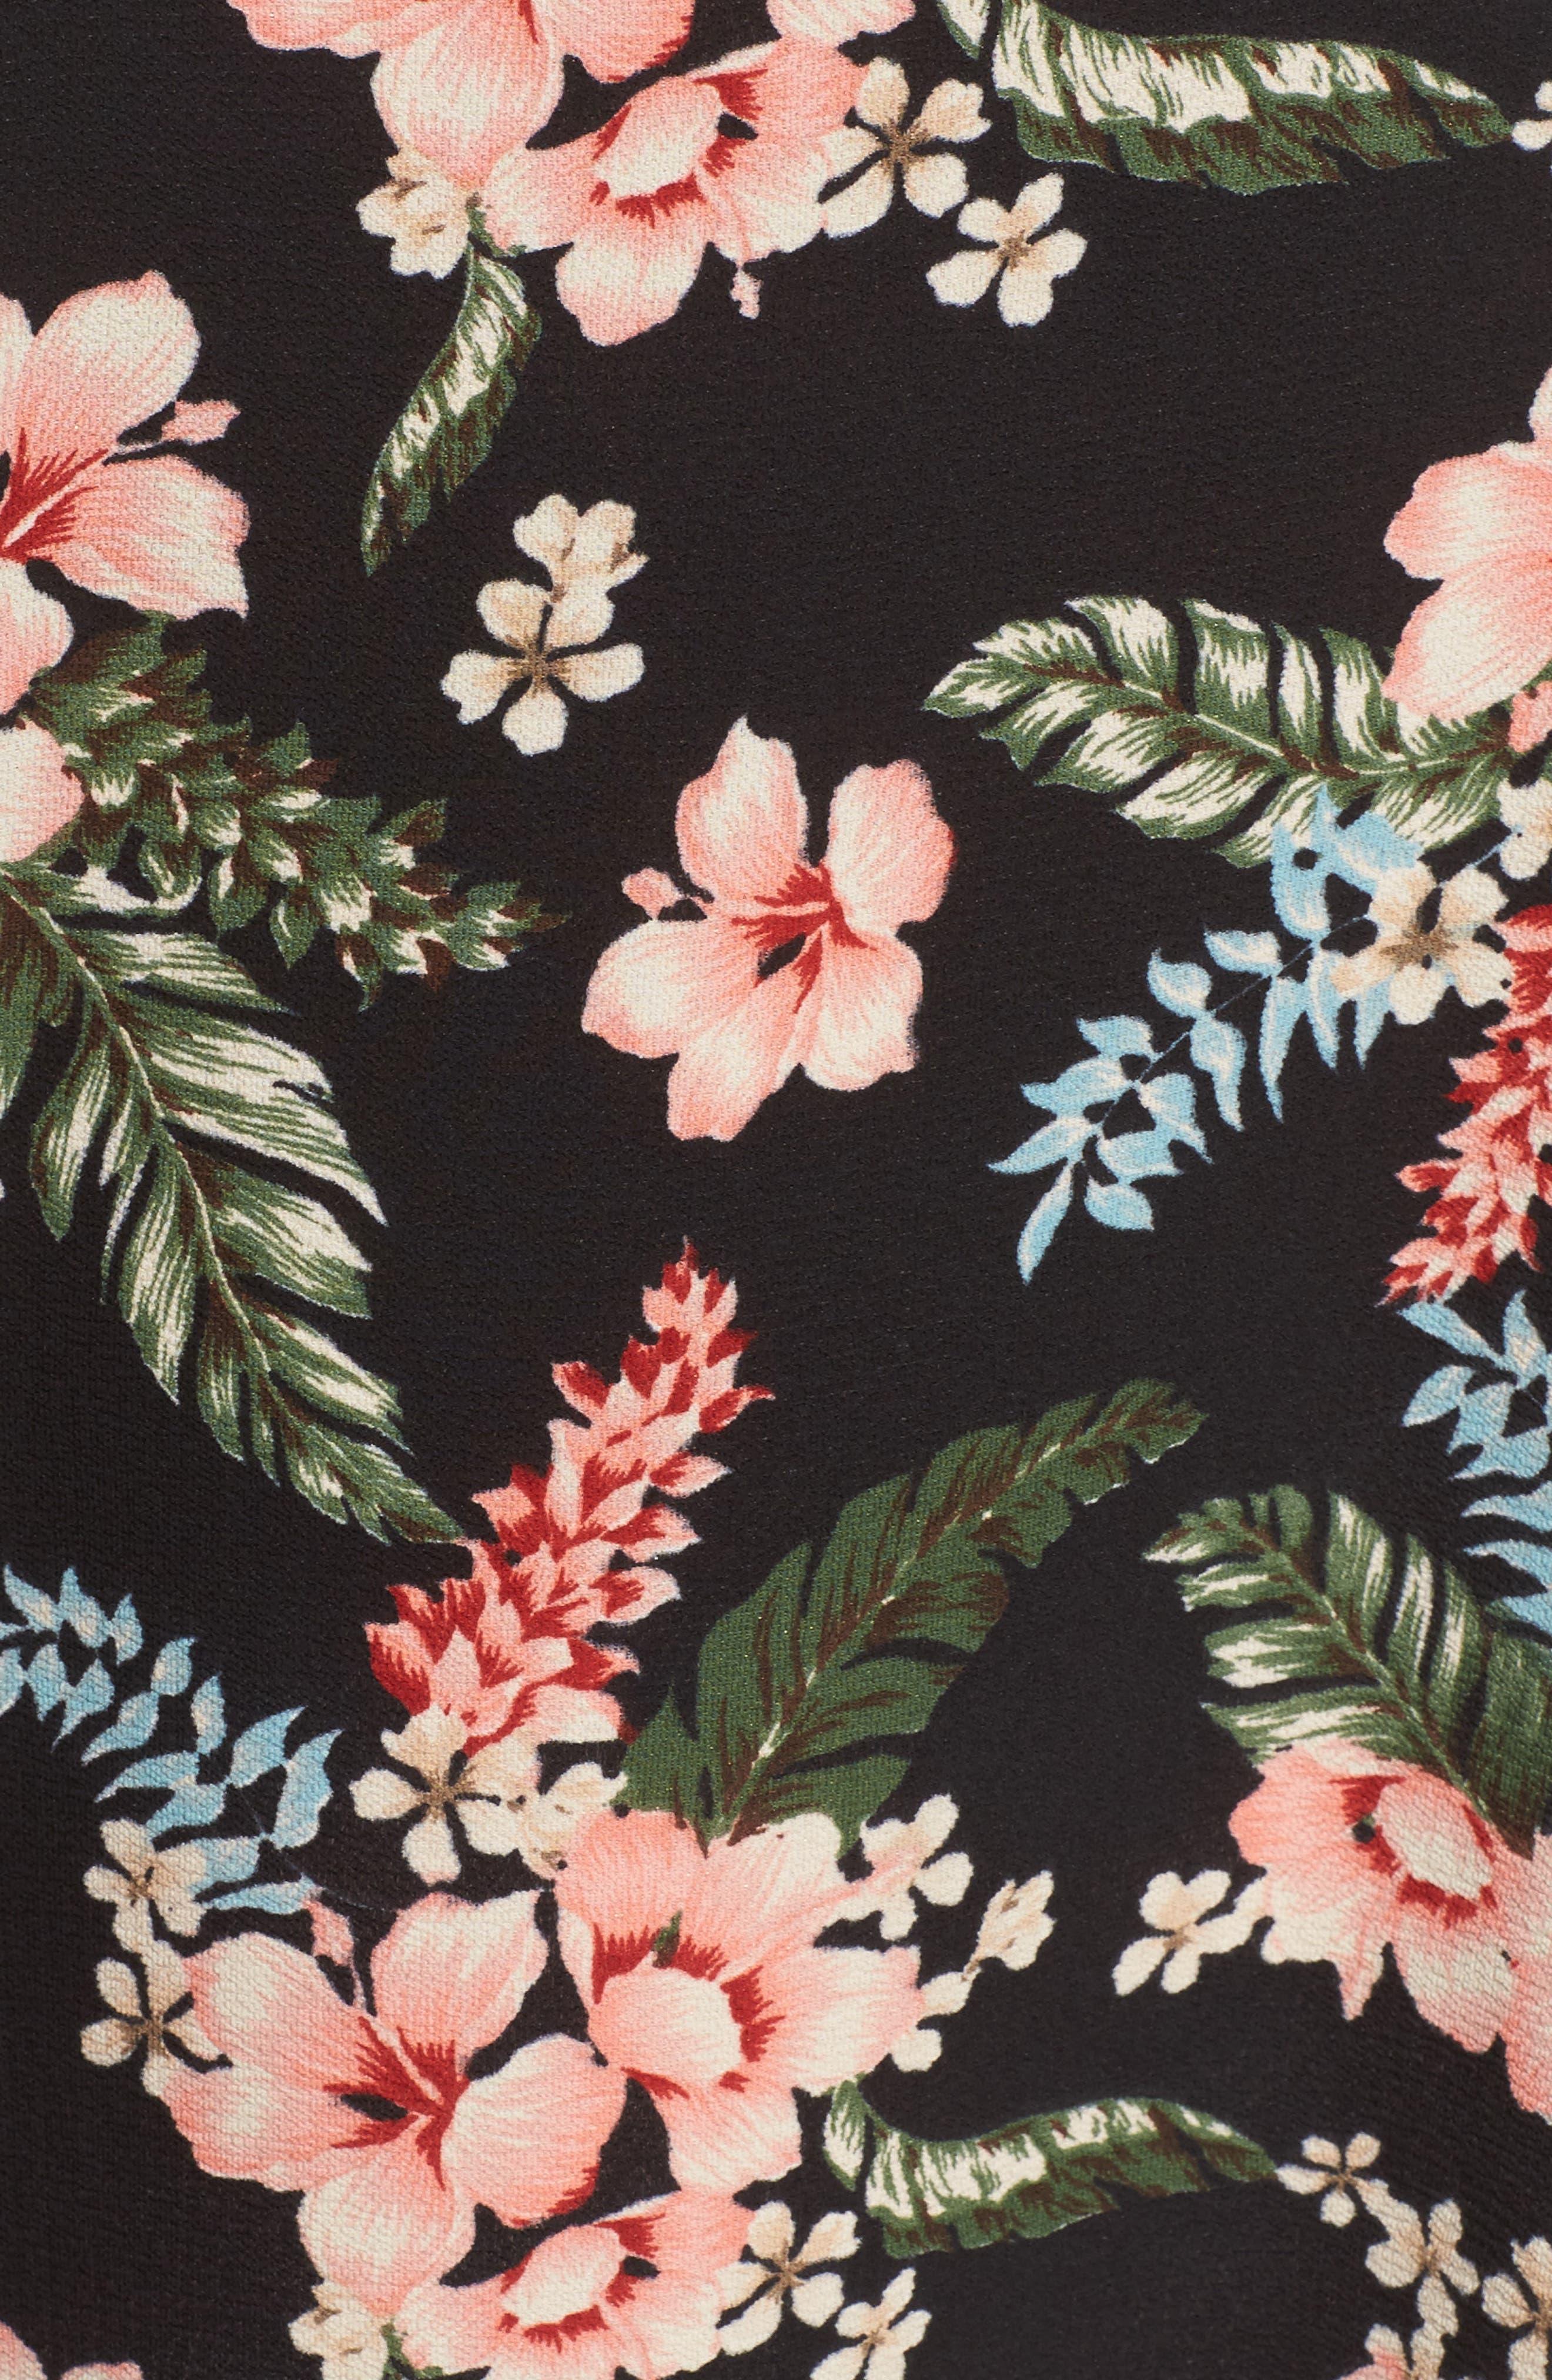 Tropical Camisole,                             Alternate thumbnail 5, color,                             001